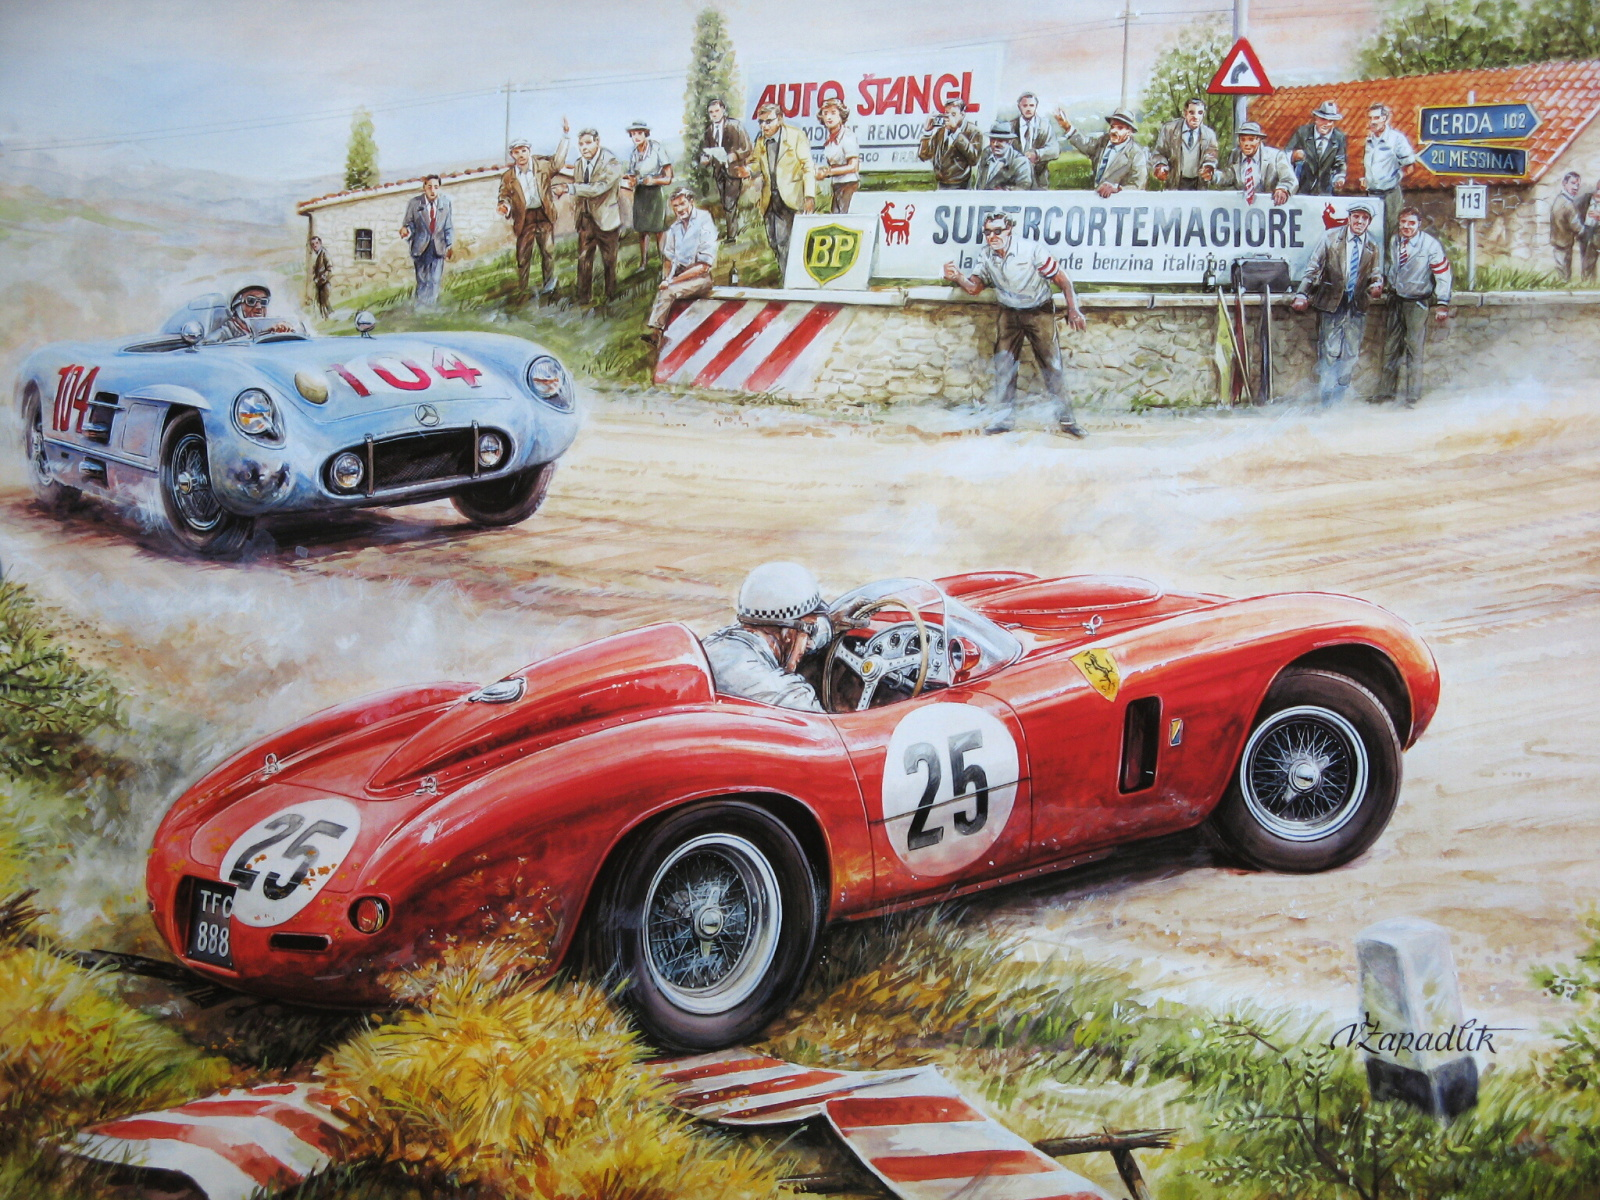 Drawn ferarri wallpaper Sports images Ferrari car sports